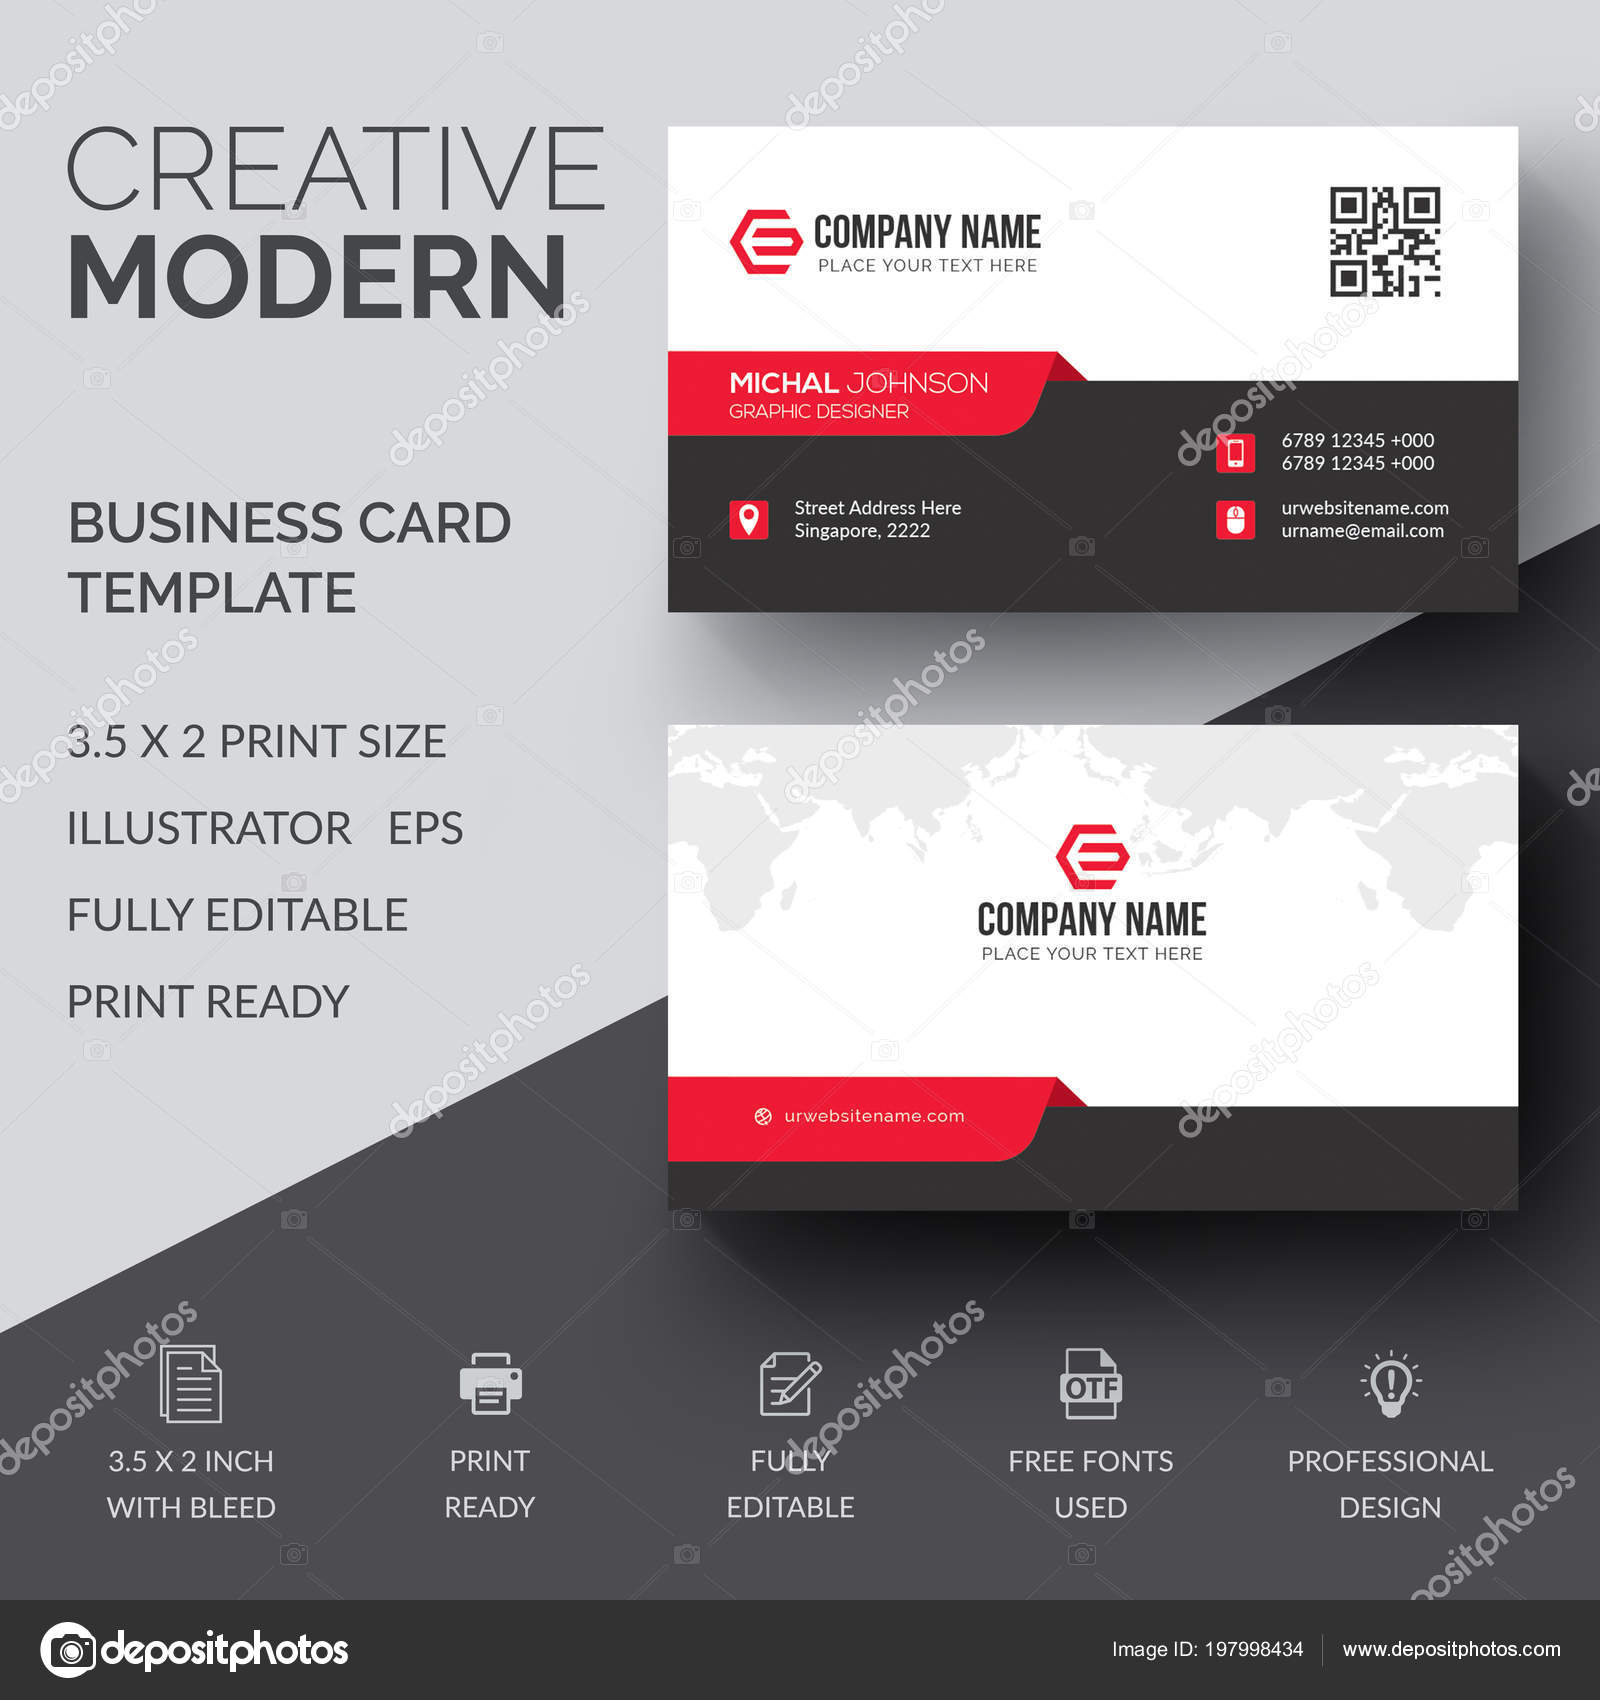 Vector Design Moderne Kreative Und Saubere Visitenkarte